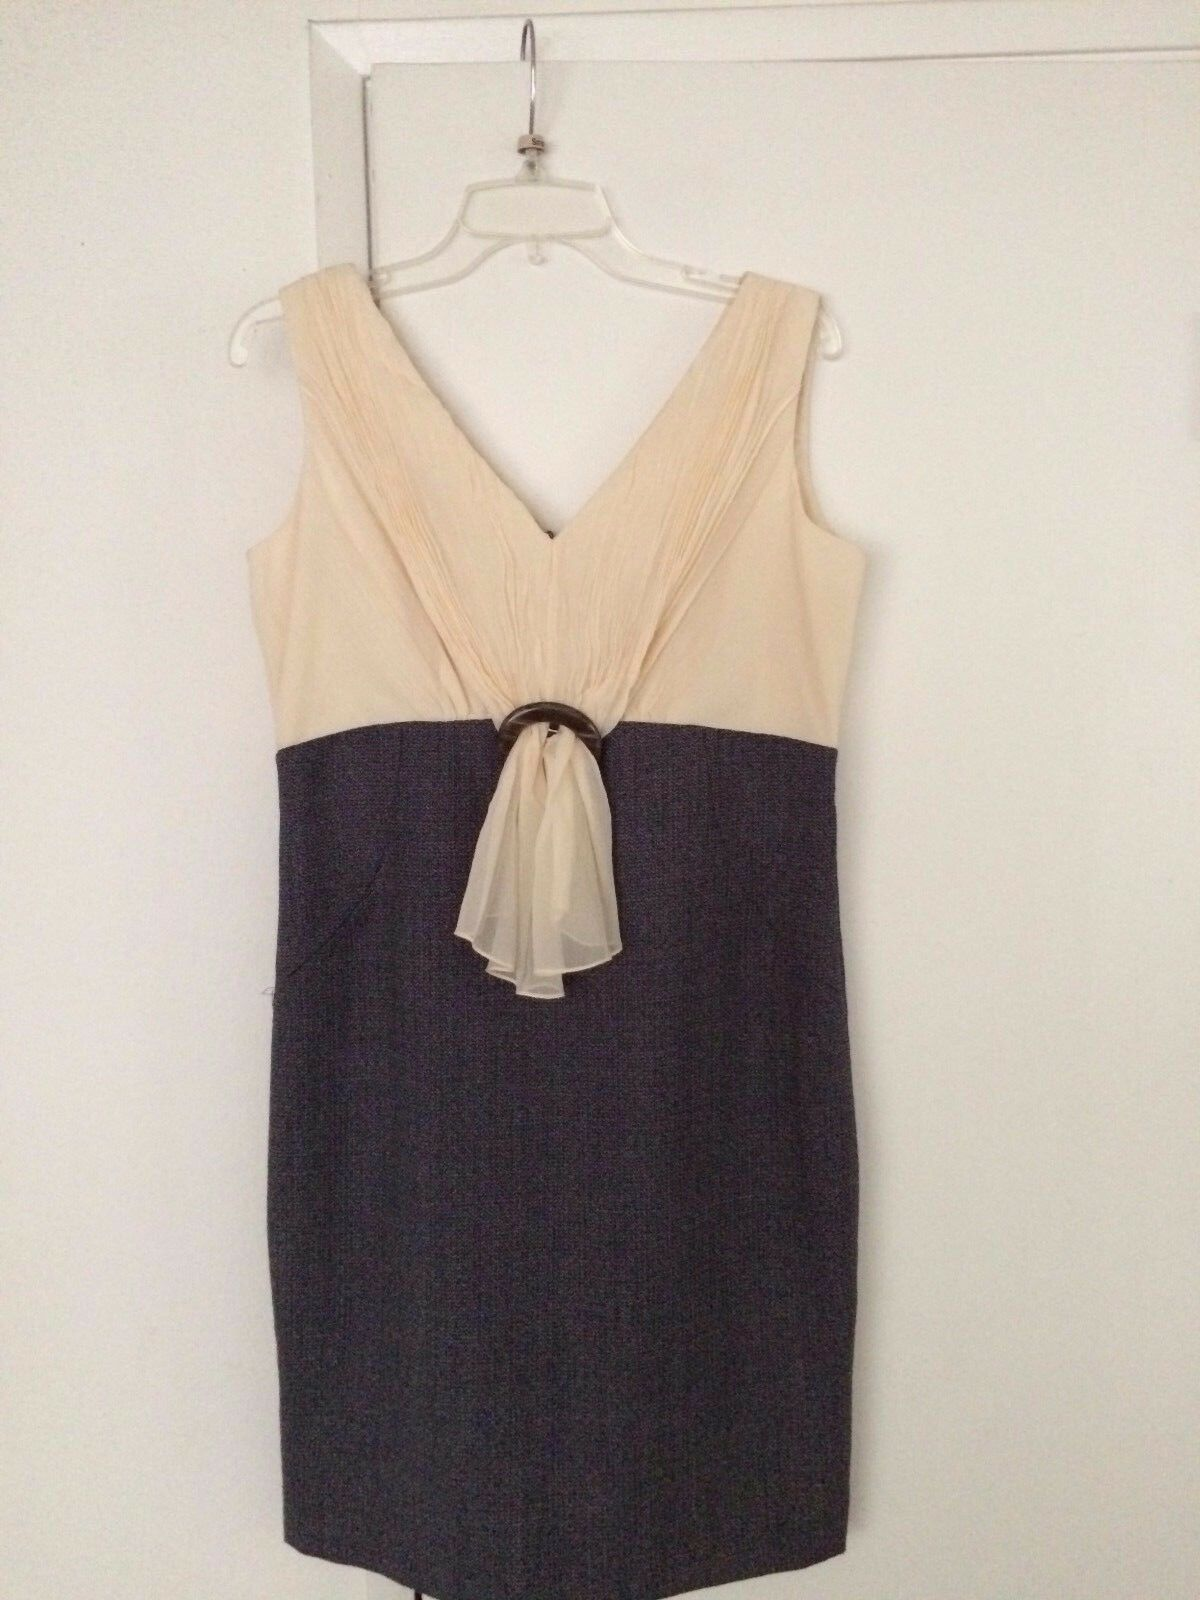 KAY UNGER  LADIES FITTED DRESS  Größe  12  NWOT